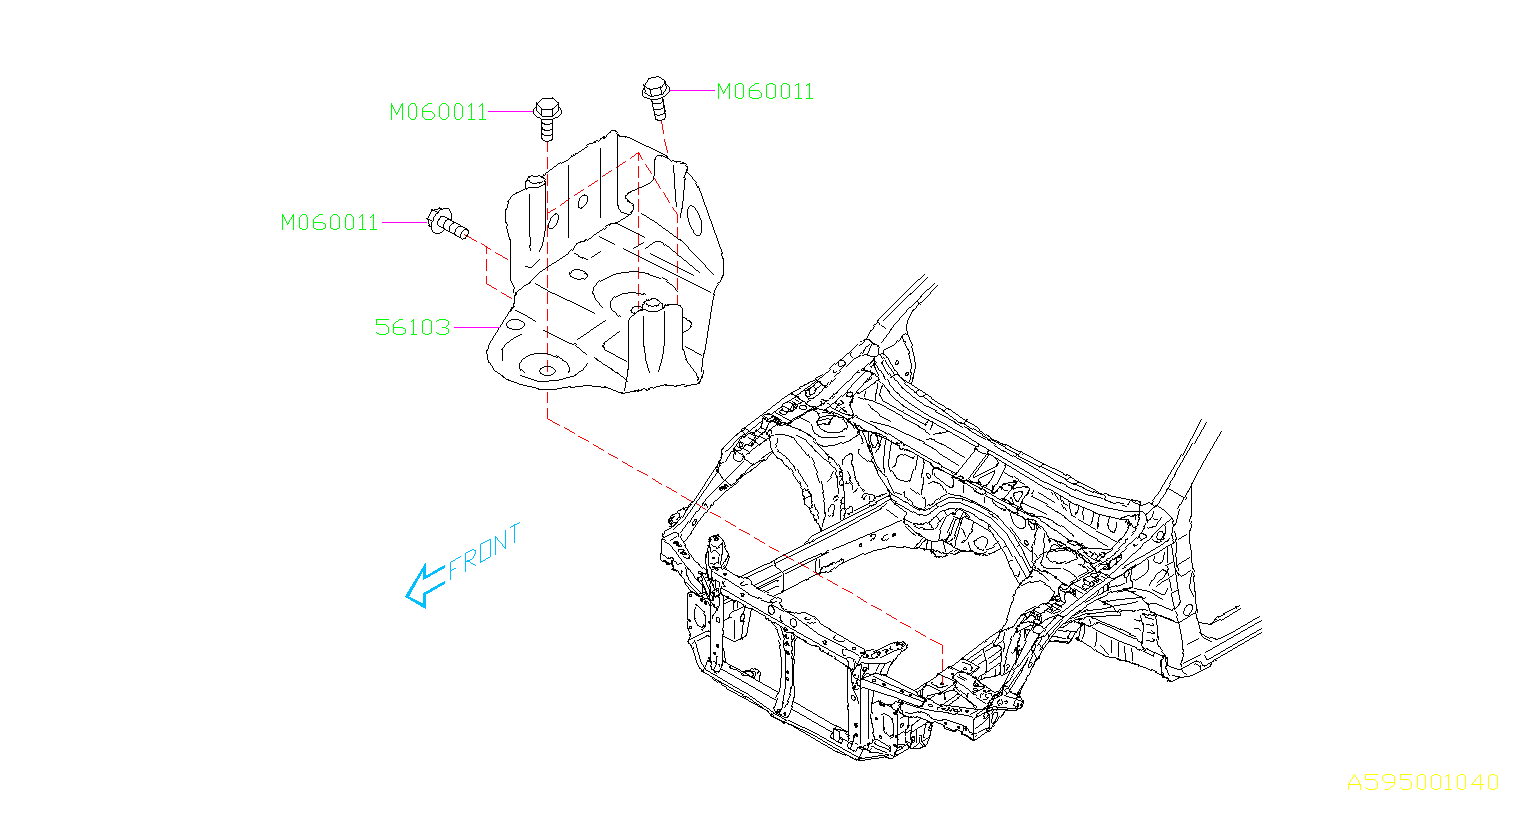 Subaru Outback Bolt Flange M10X22. FRAME, CHASSIS